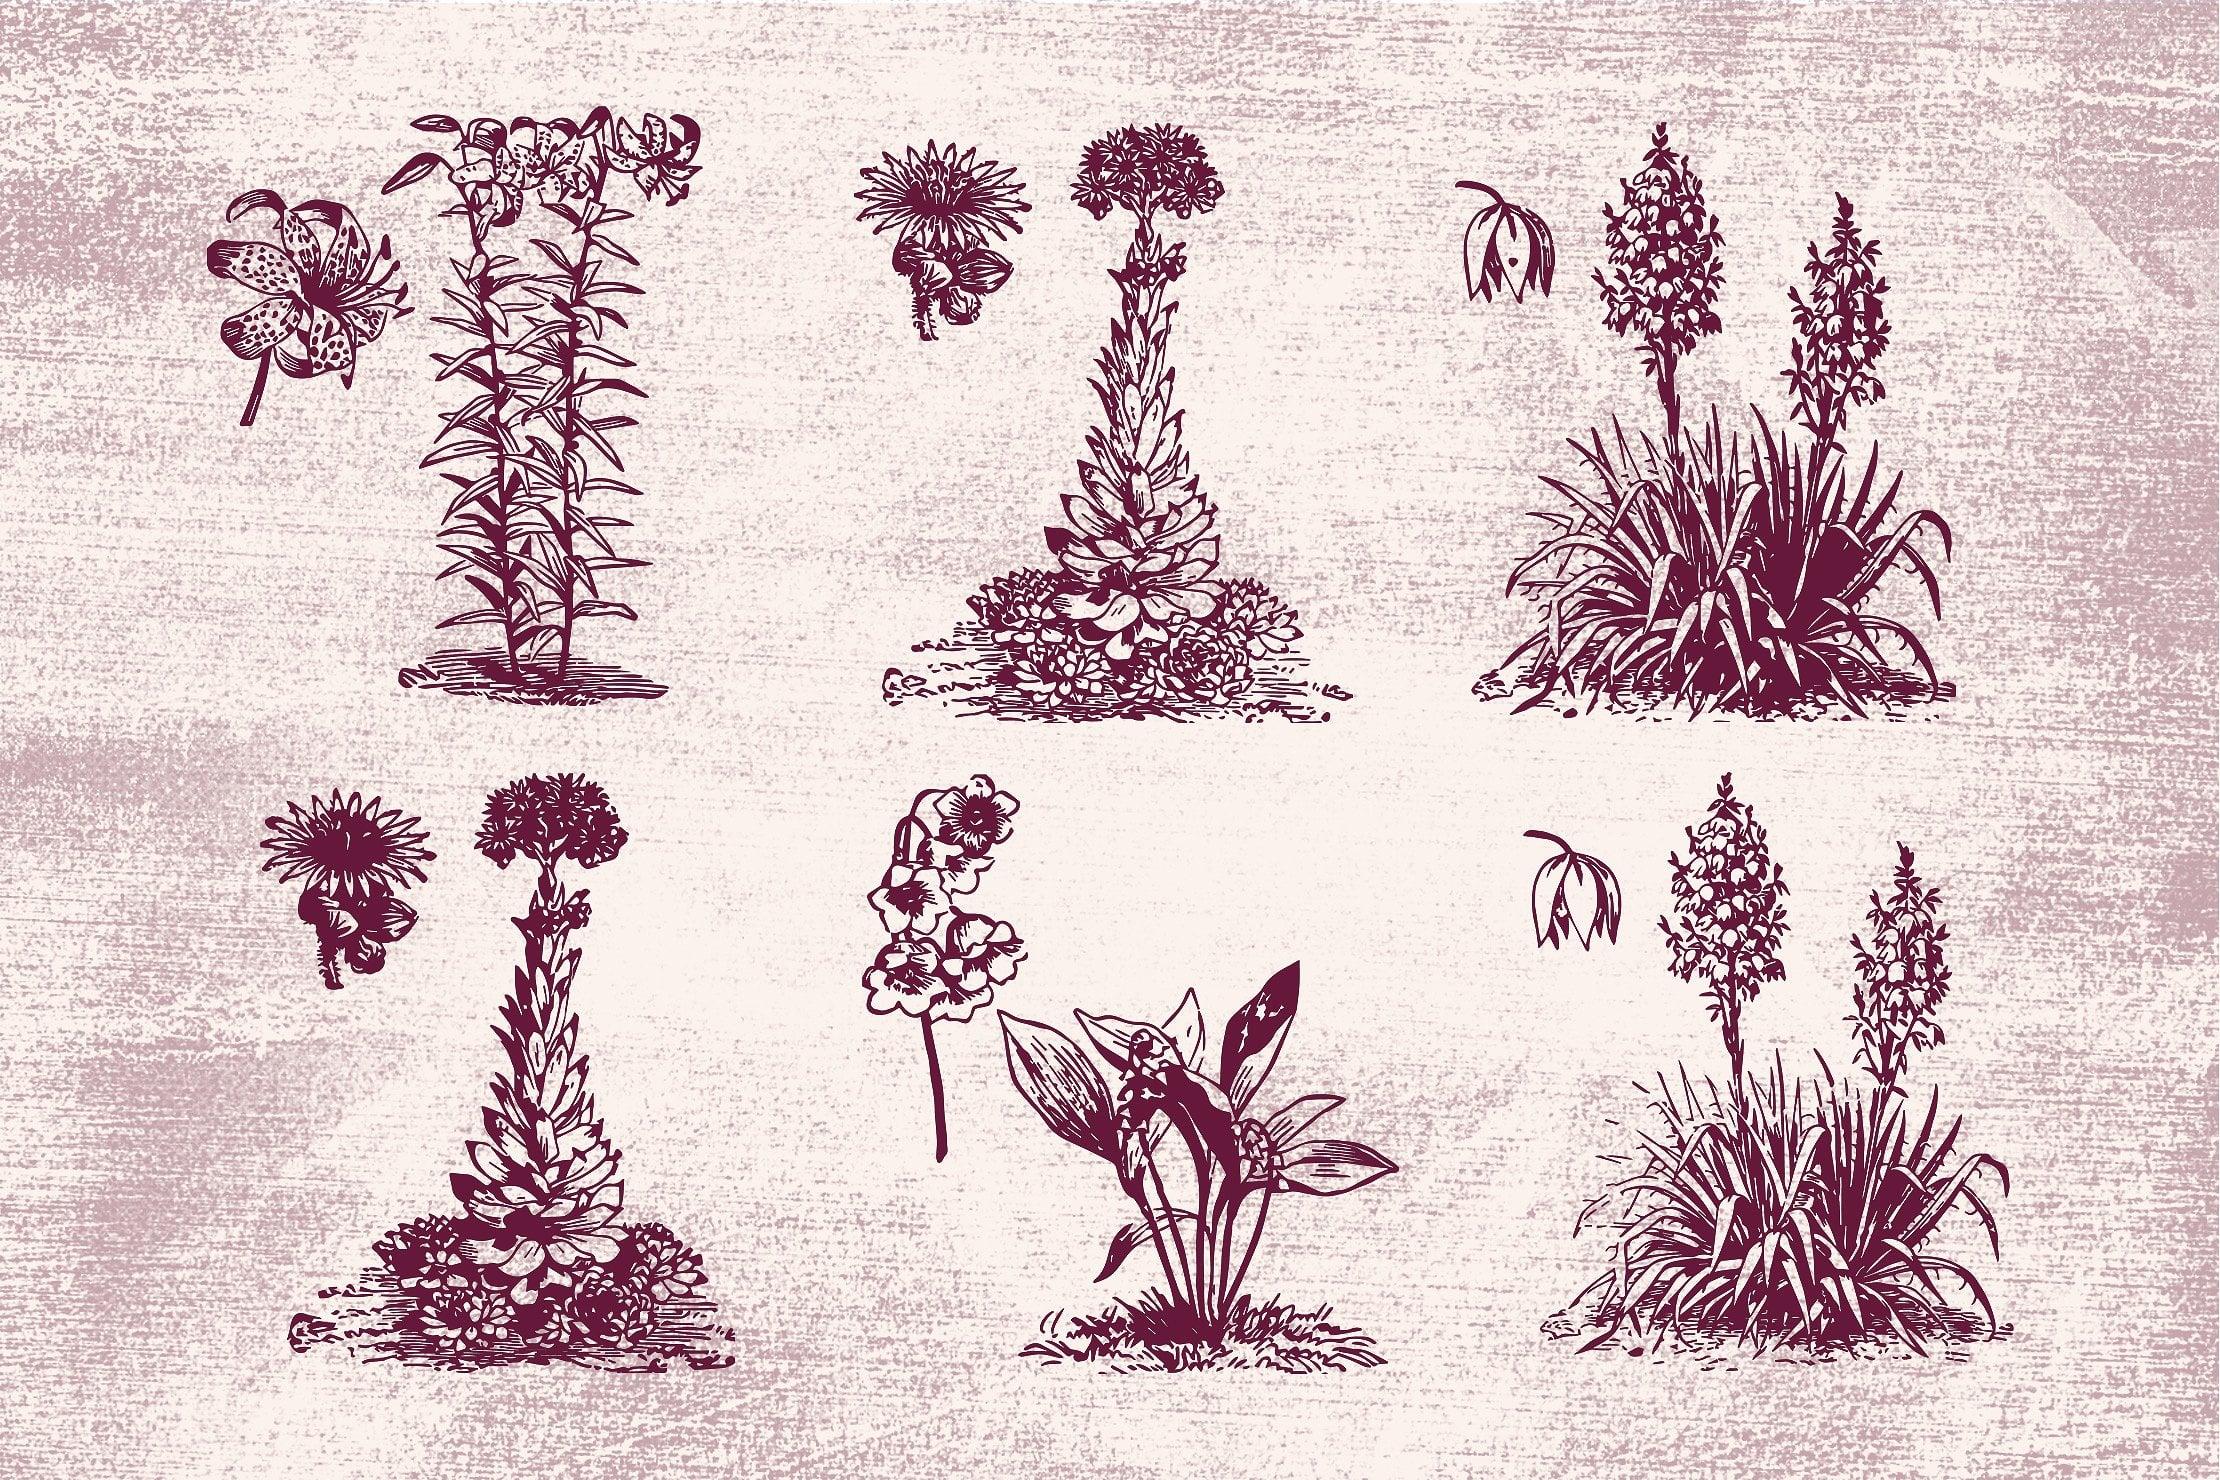 96 Floral Vintage Vector Illustrations [96 Items, EPS + PNG] - flowers 5